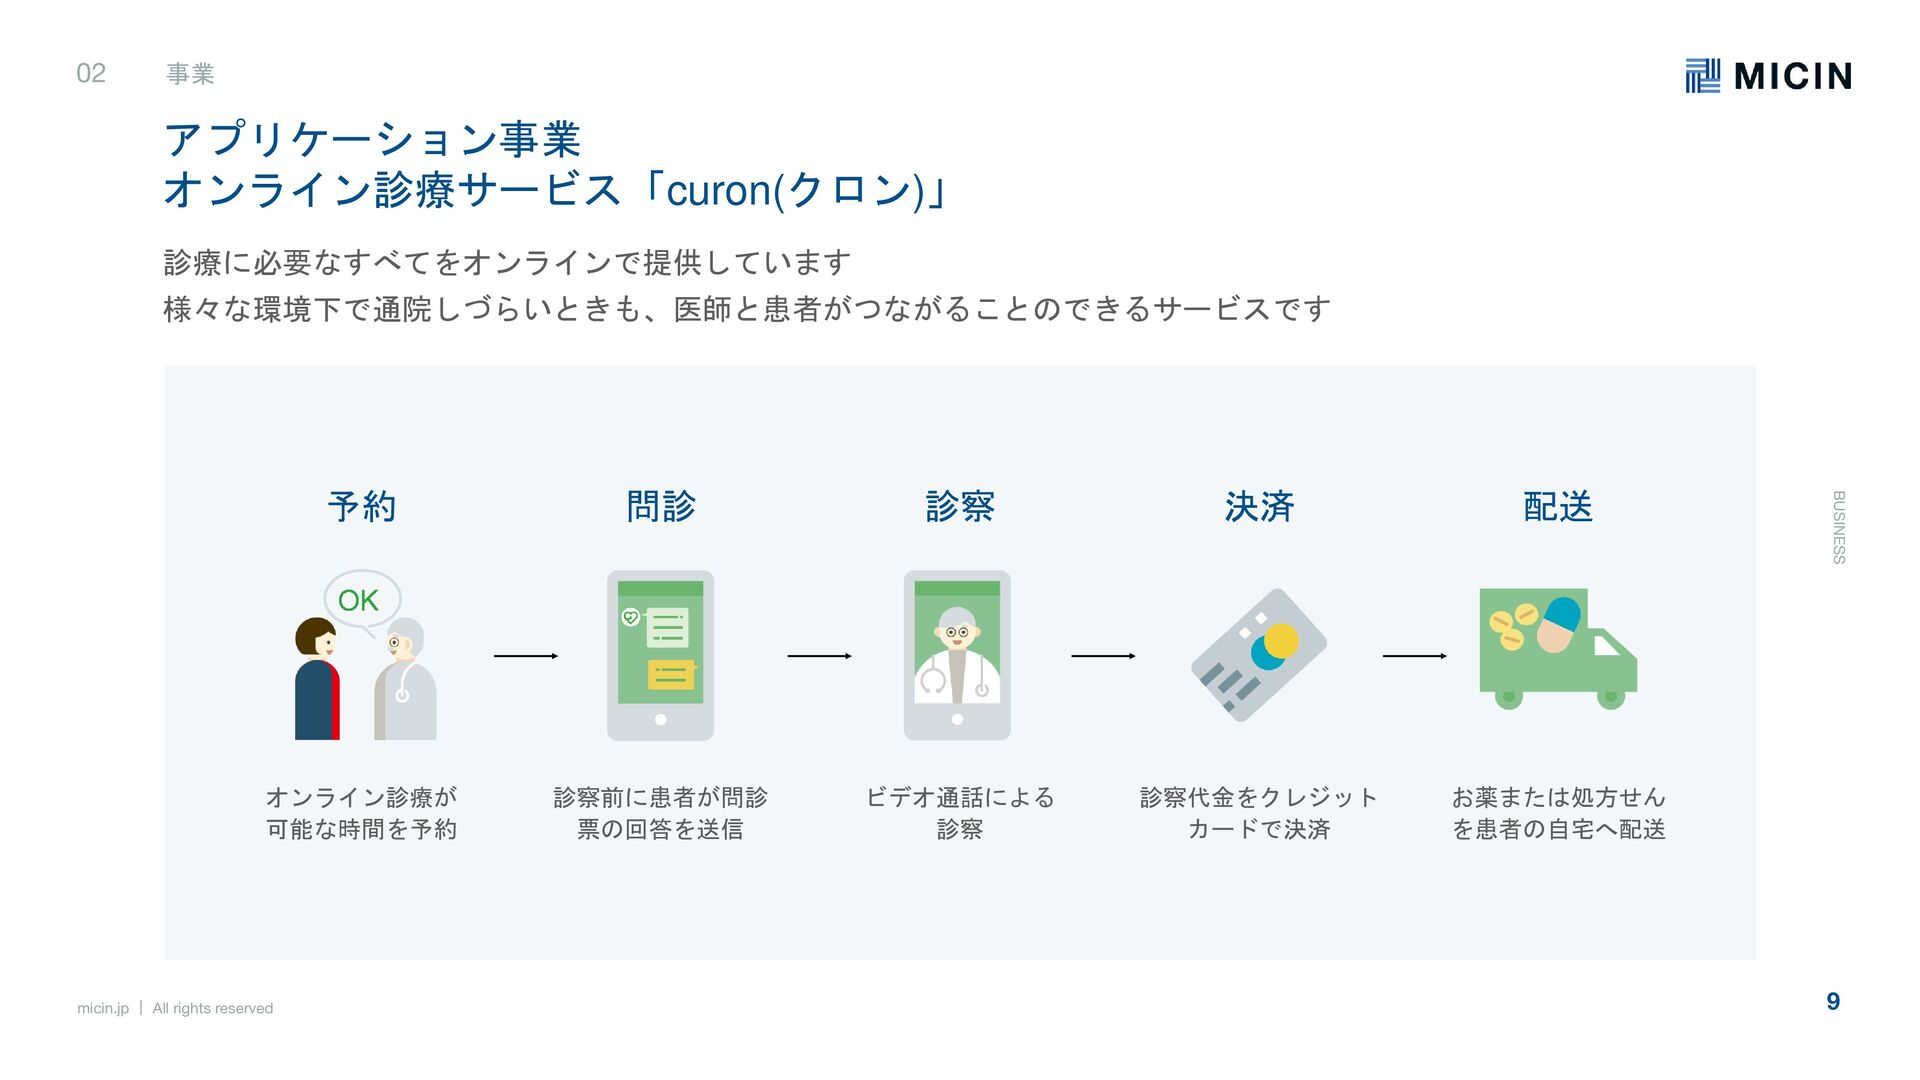 micin.jp   All rights reserved 9 事業 BUSINESS 事業...